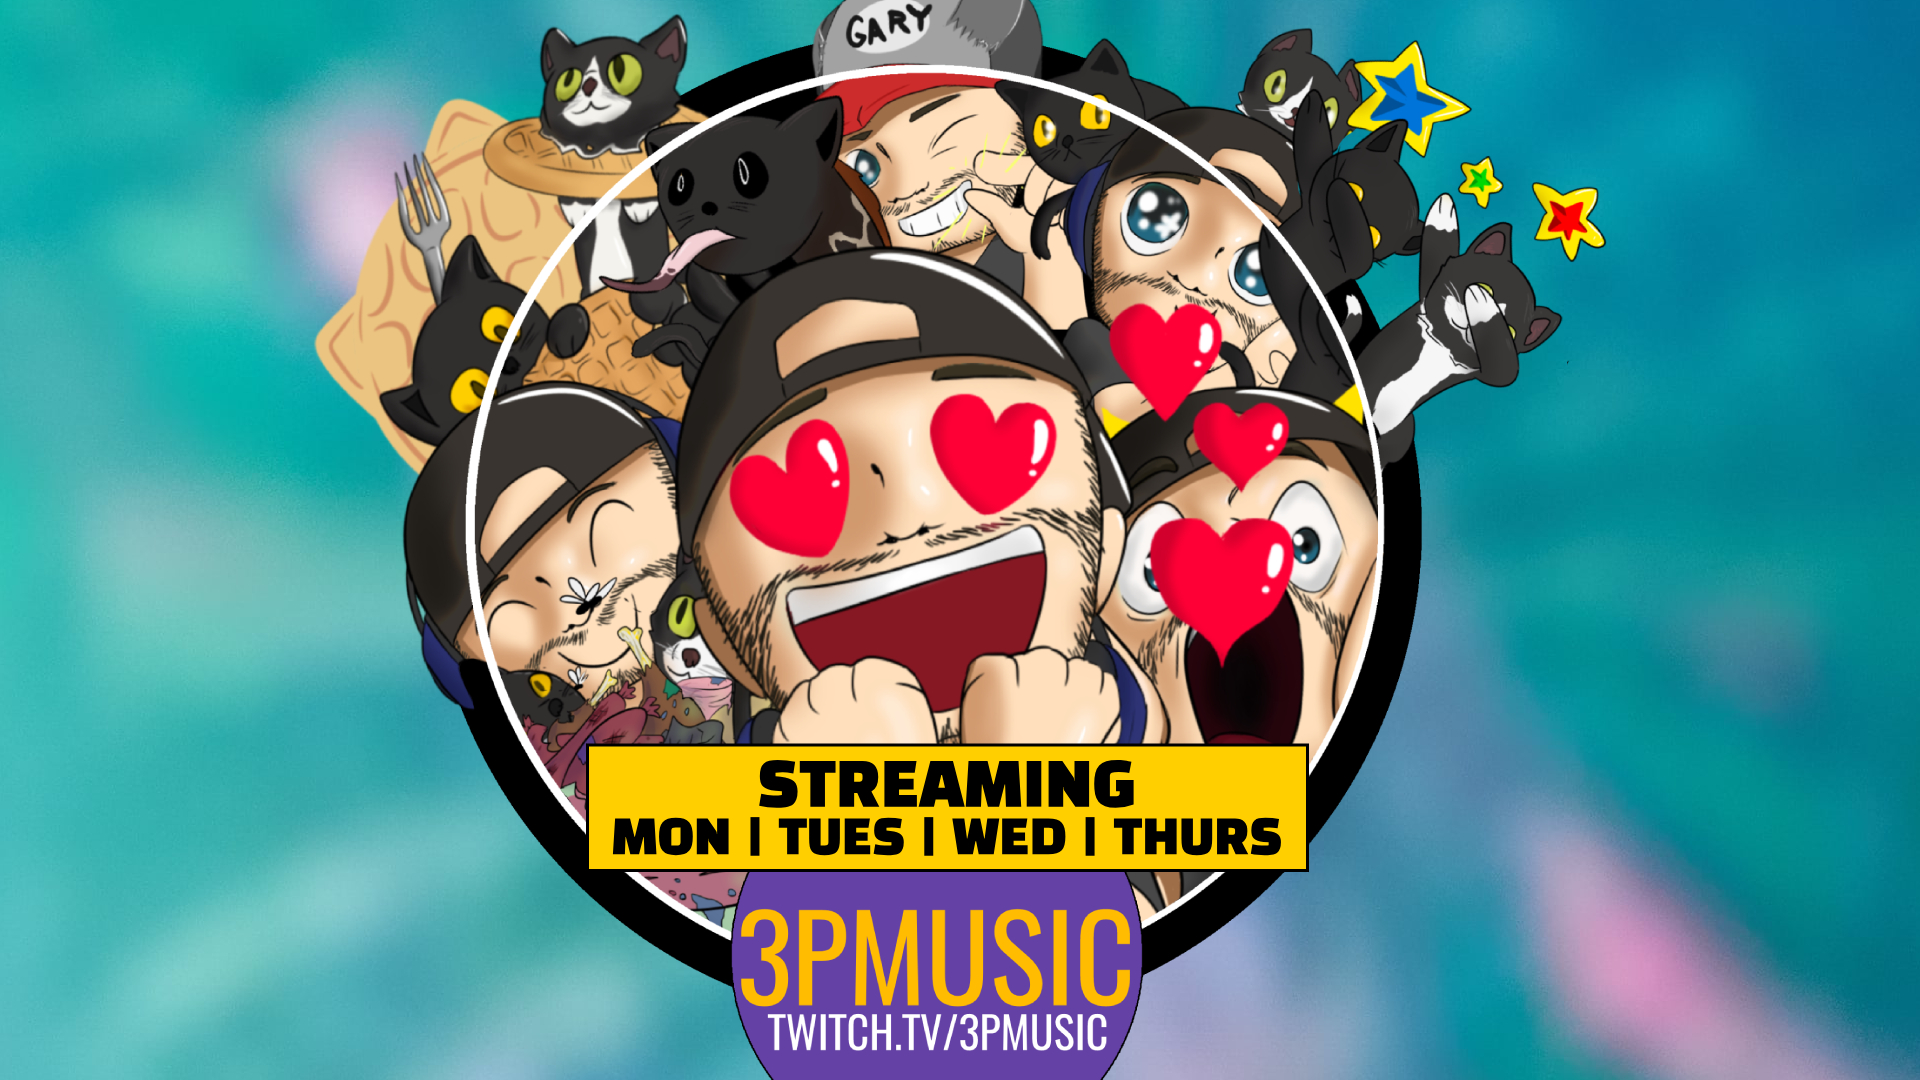 CASEY 3PM CLARK — Twitch Channel Update 07/27/18